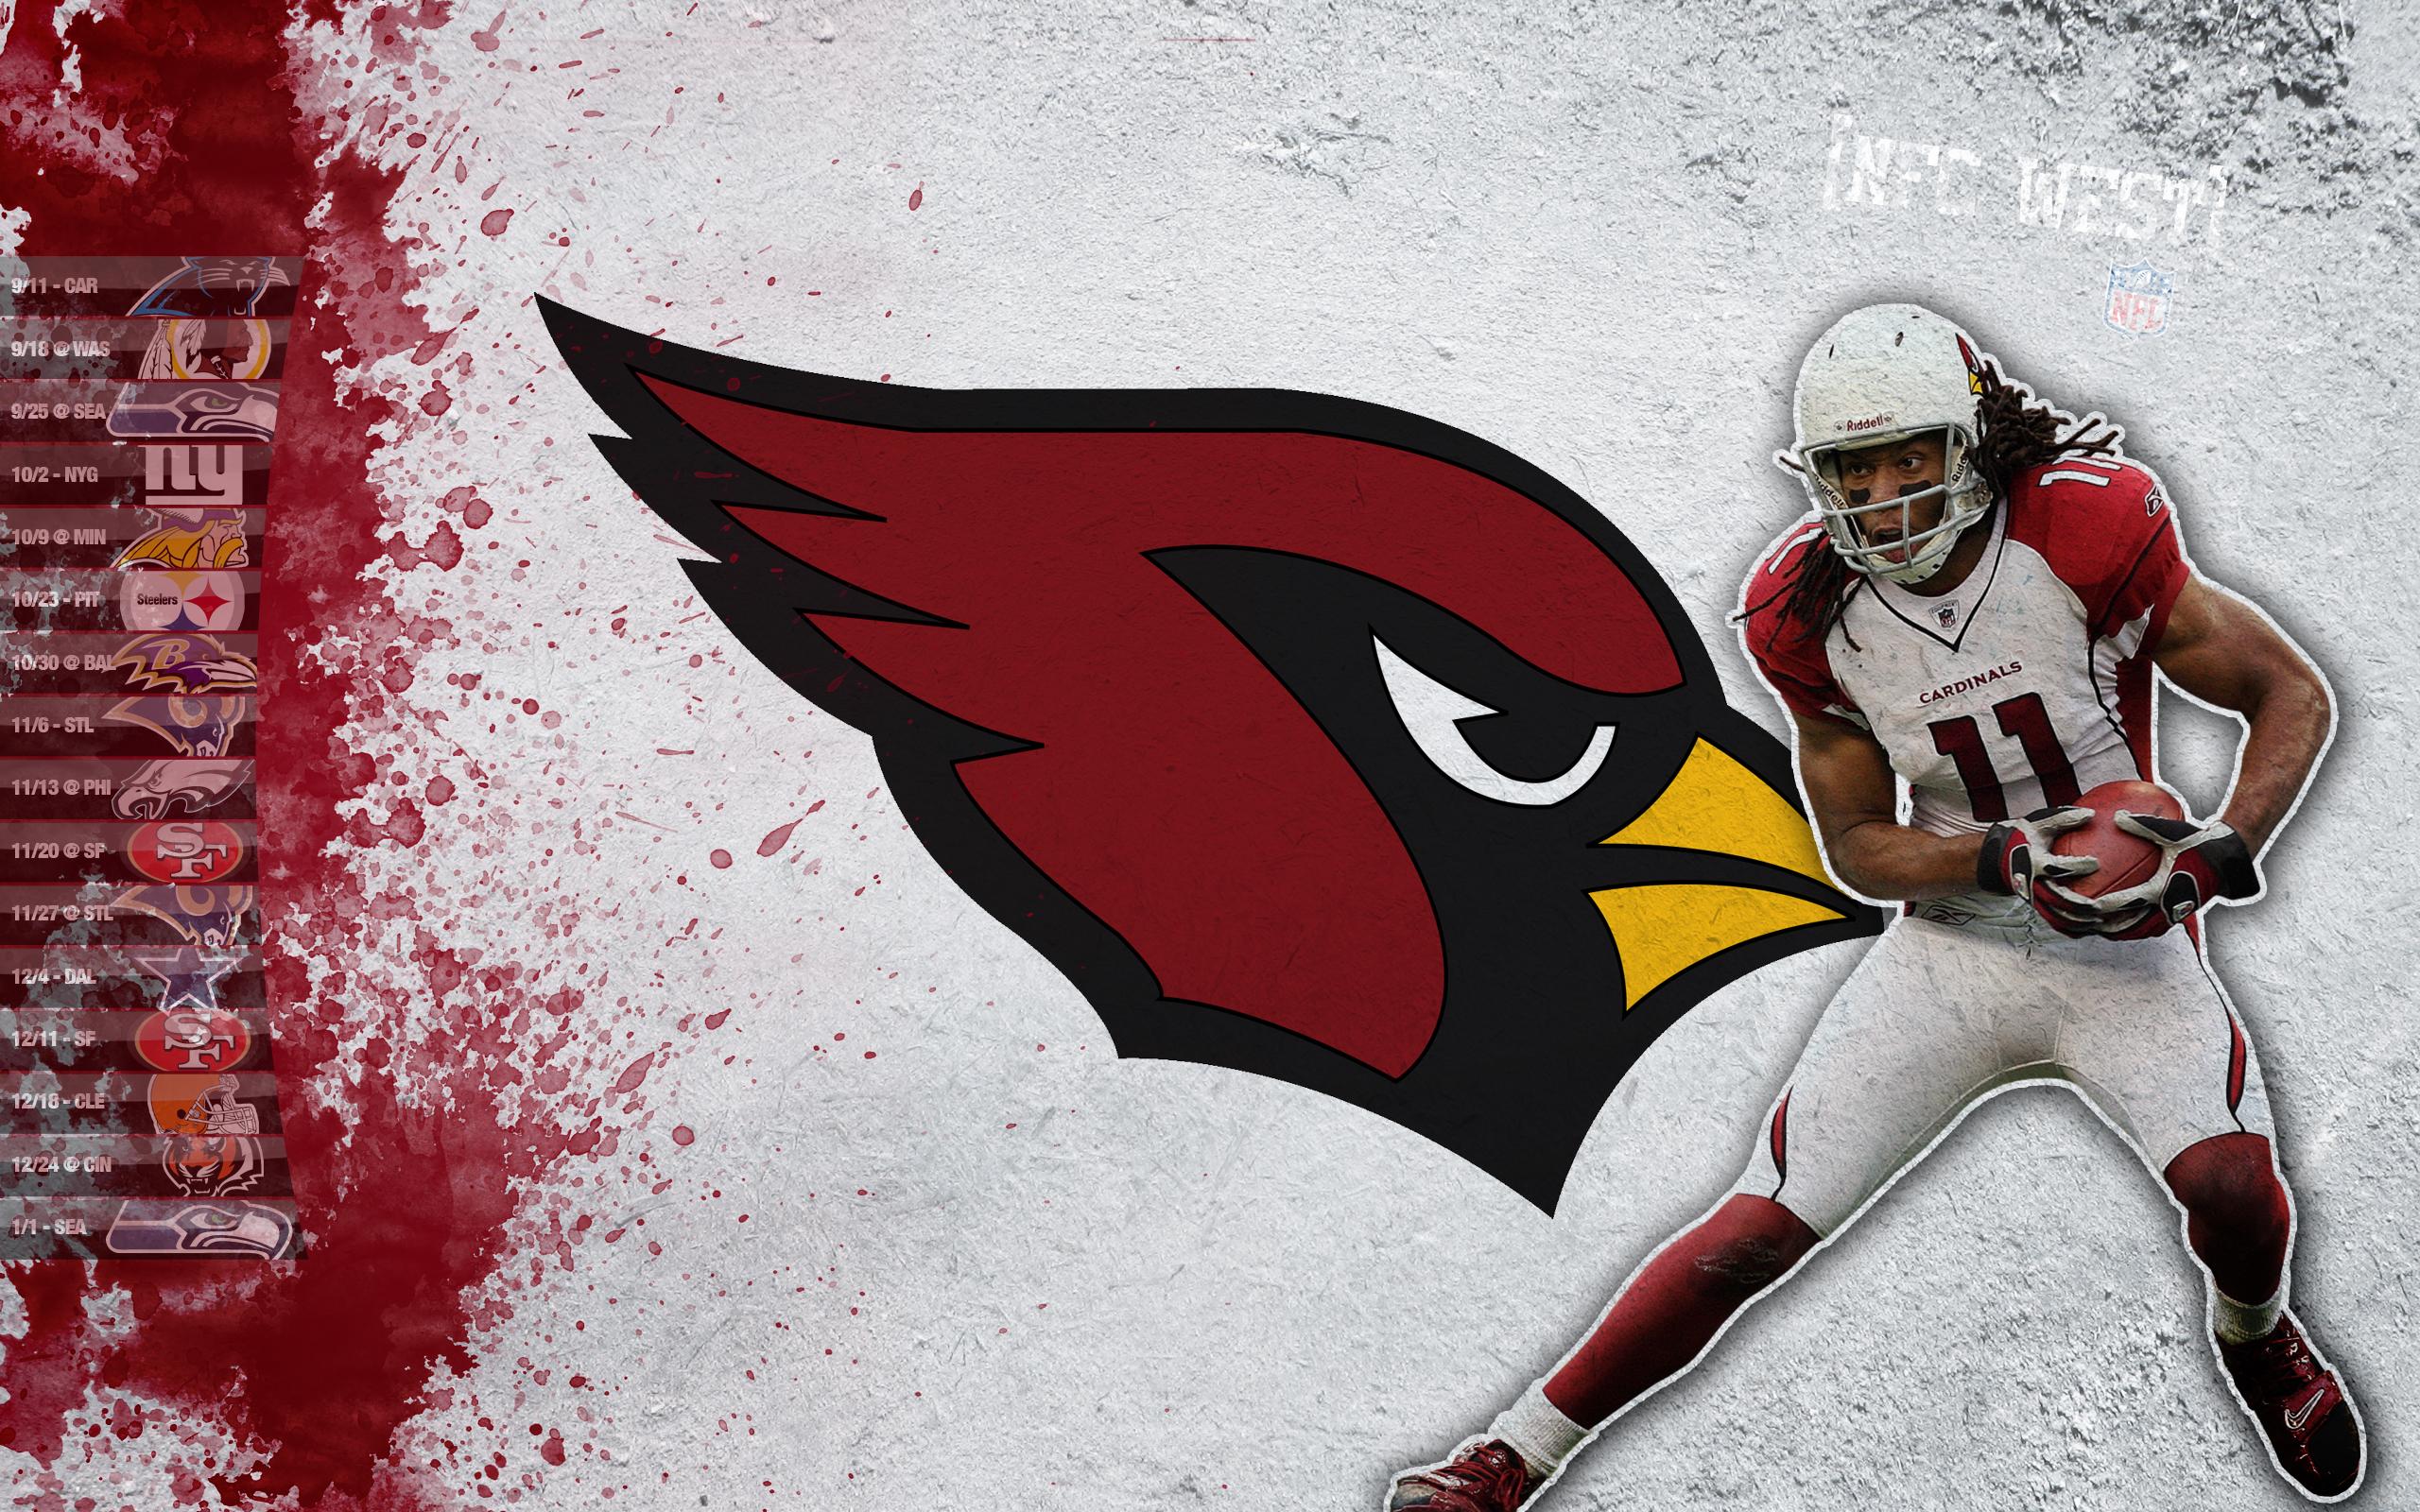 [49+] Cool Arizona Cardinals Wallpaper On WallpaperSafari